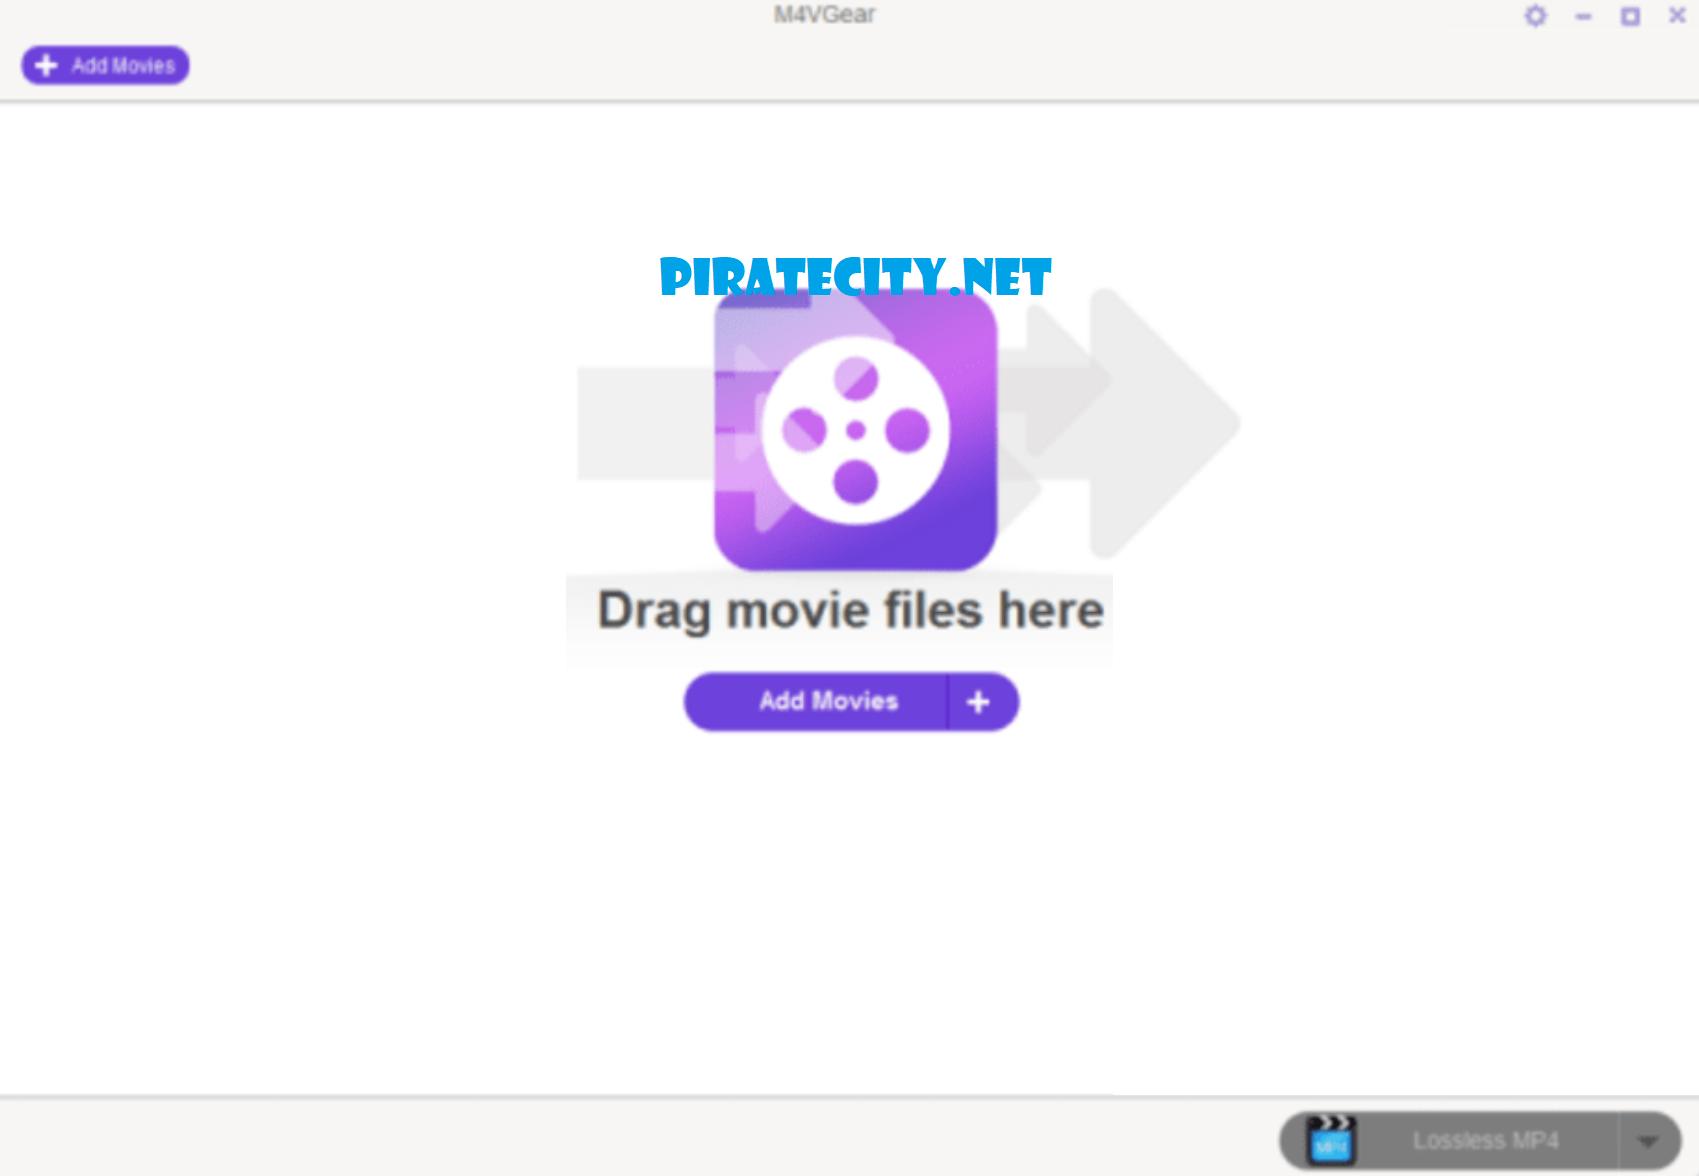 M4VGear DRM Media Converter 5.4.6 full Crack